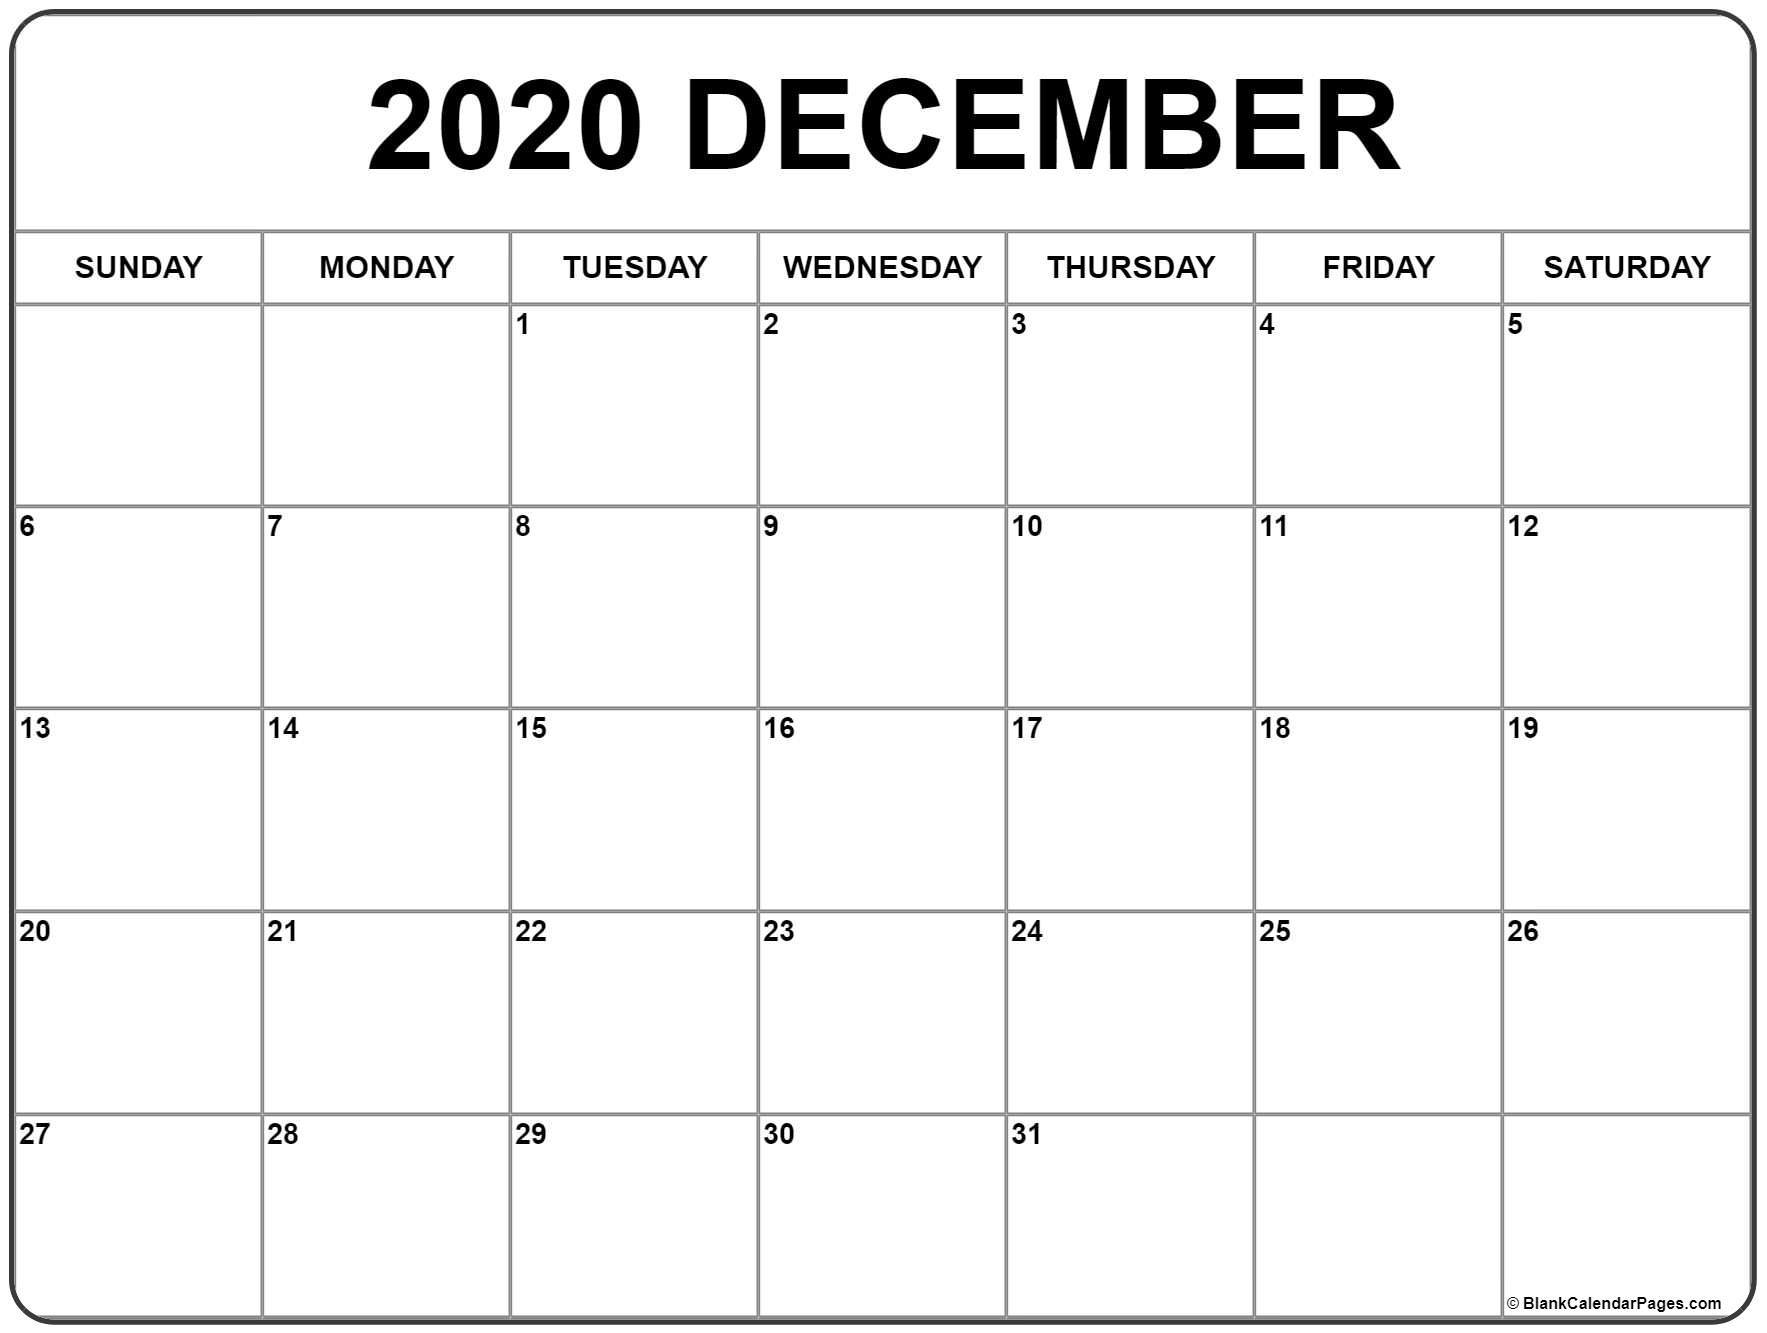 December 2020 Calendar | Free Printable Monthly Calendars  2020 Calendar Printable